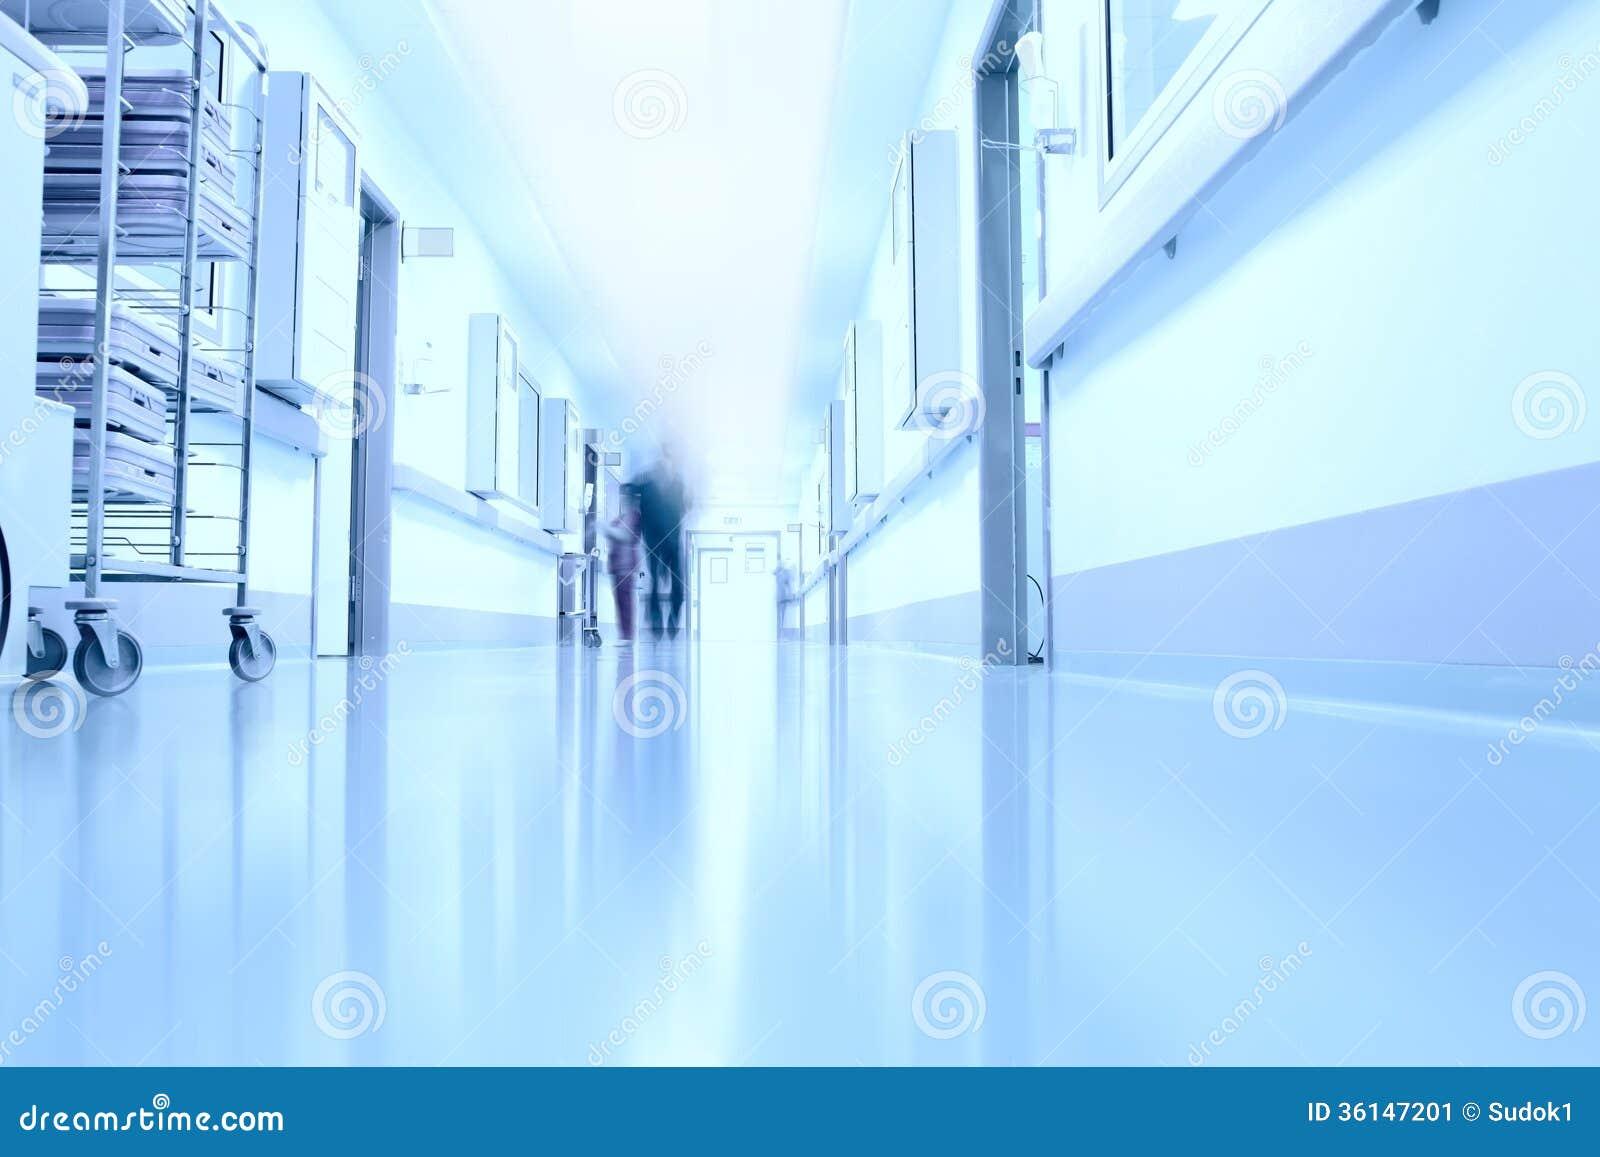 Im Korridor eines modernen Krankenhauses